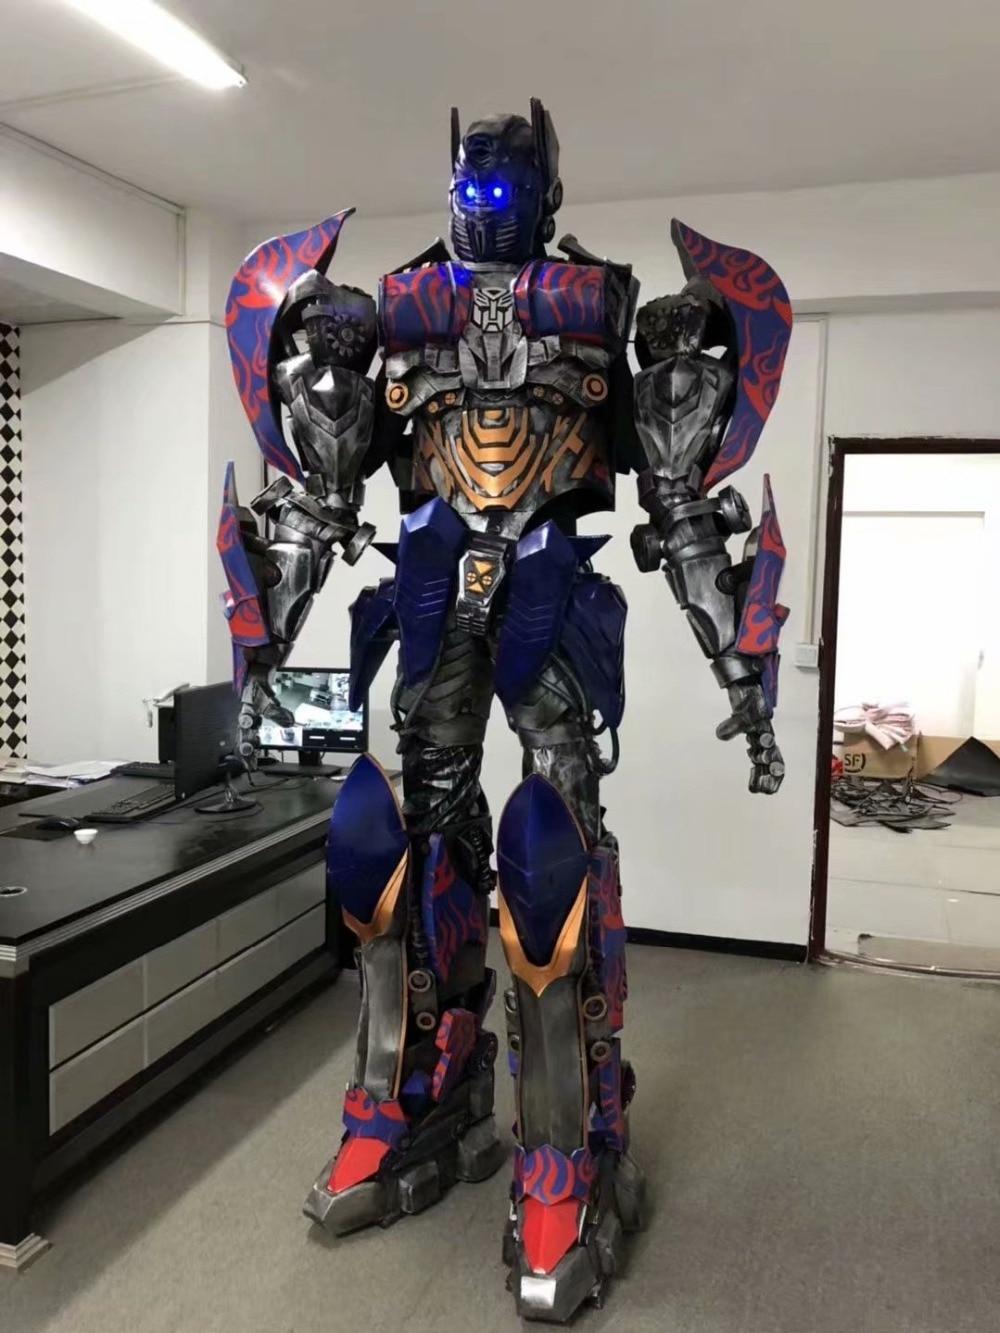 O wearable optimus prime traje de transformadores 5 o último cavaleiro transformadores cosplay trajes de festa